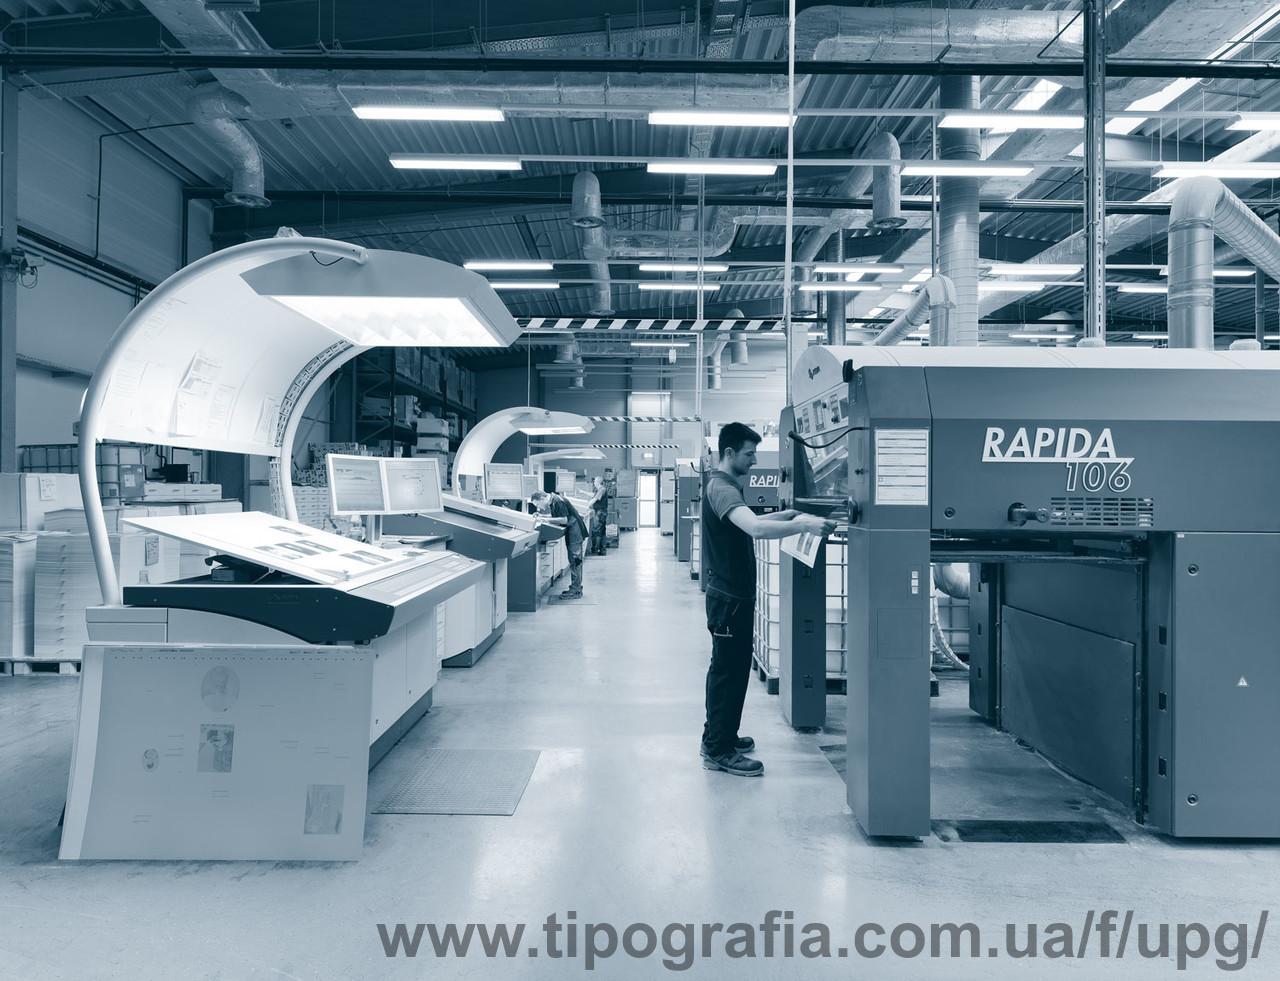 Druckerei Rindt идёт к успеху с перфектором Rapida 106-8